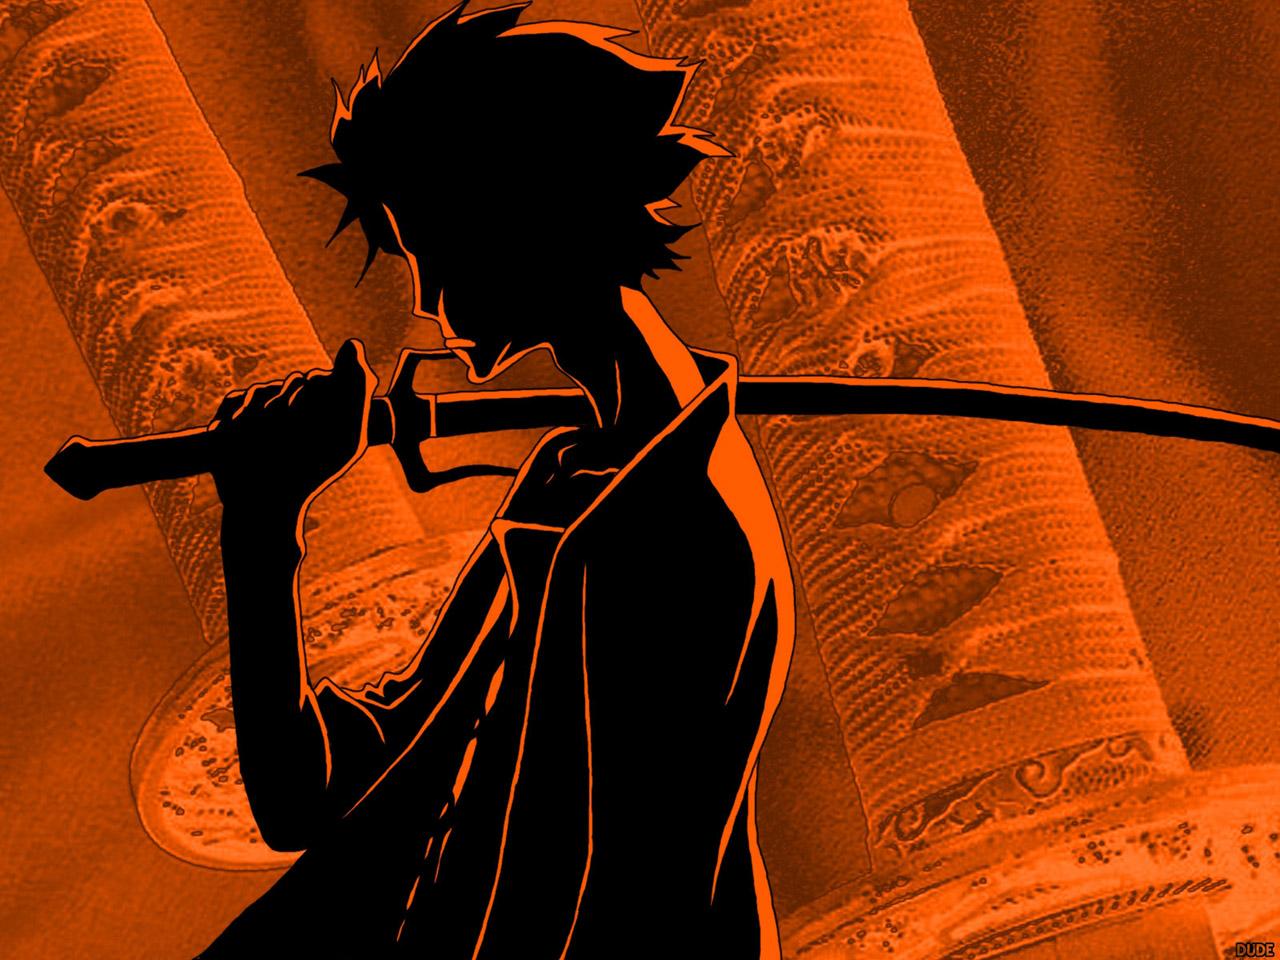 l'alliance des samouraï légendaires Index du Forum